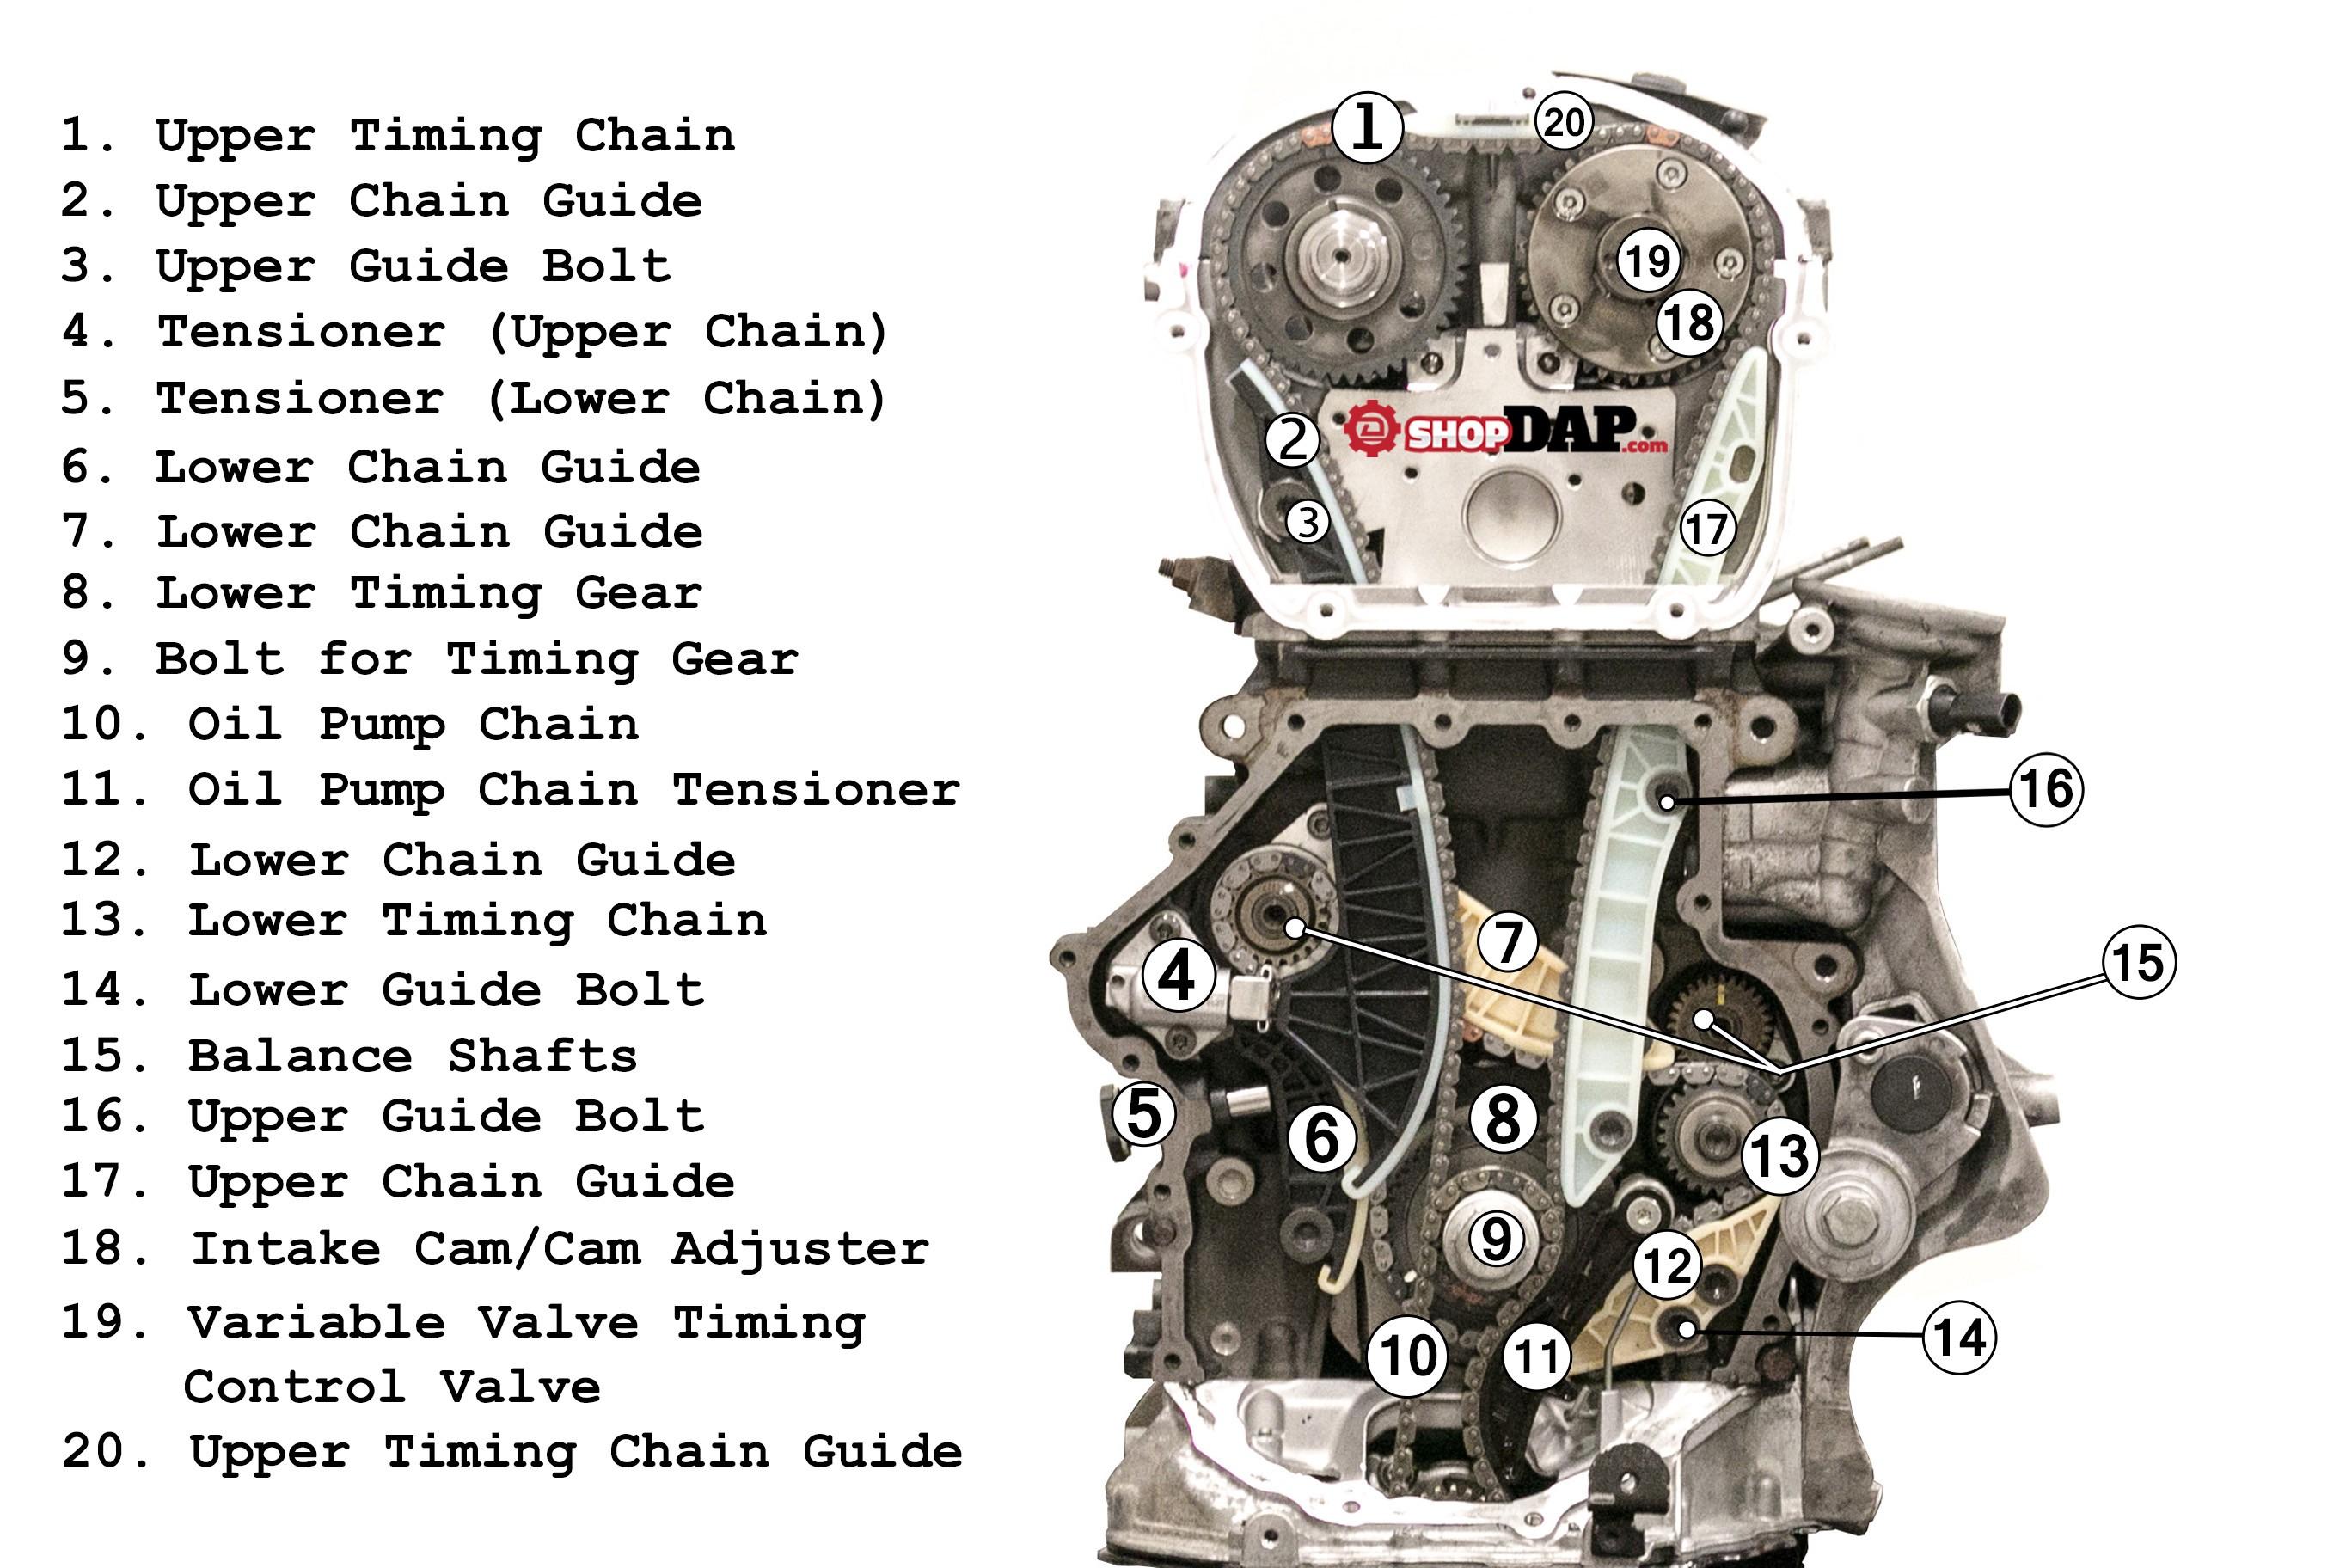 2 0 Tsi Engine Diagram 2 2 0t Tsi Timing Chain Ponent Diagram for Vw and Audi Deutsche Of 2 0 Tsi Engine Diagram 2